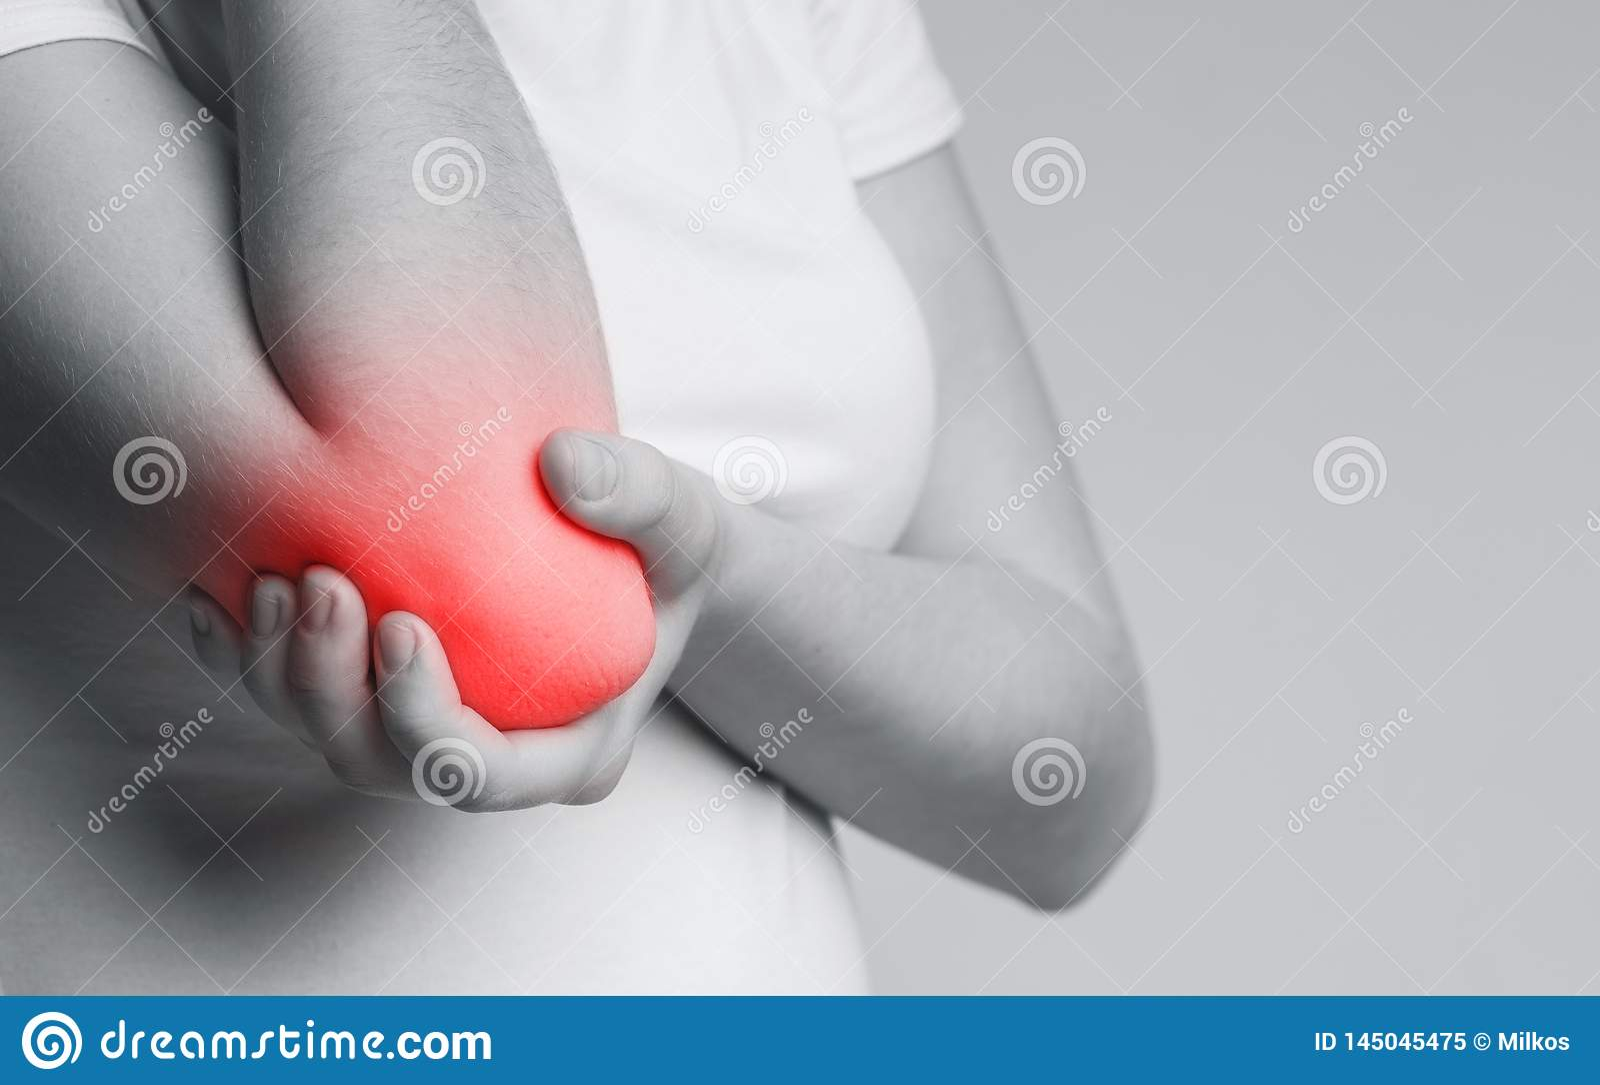 dolor muscular brazo